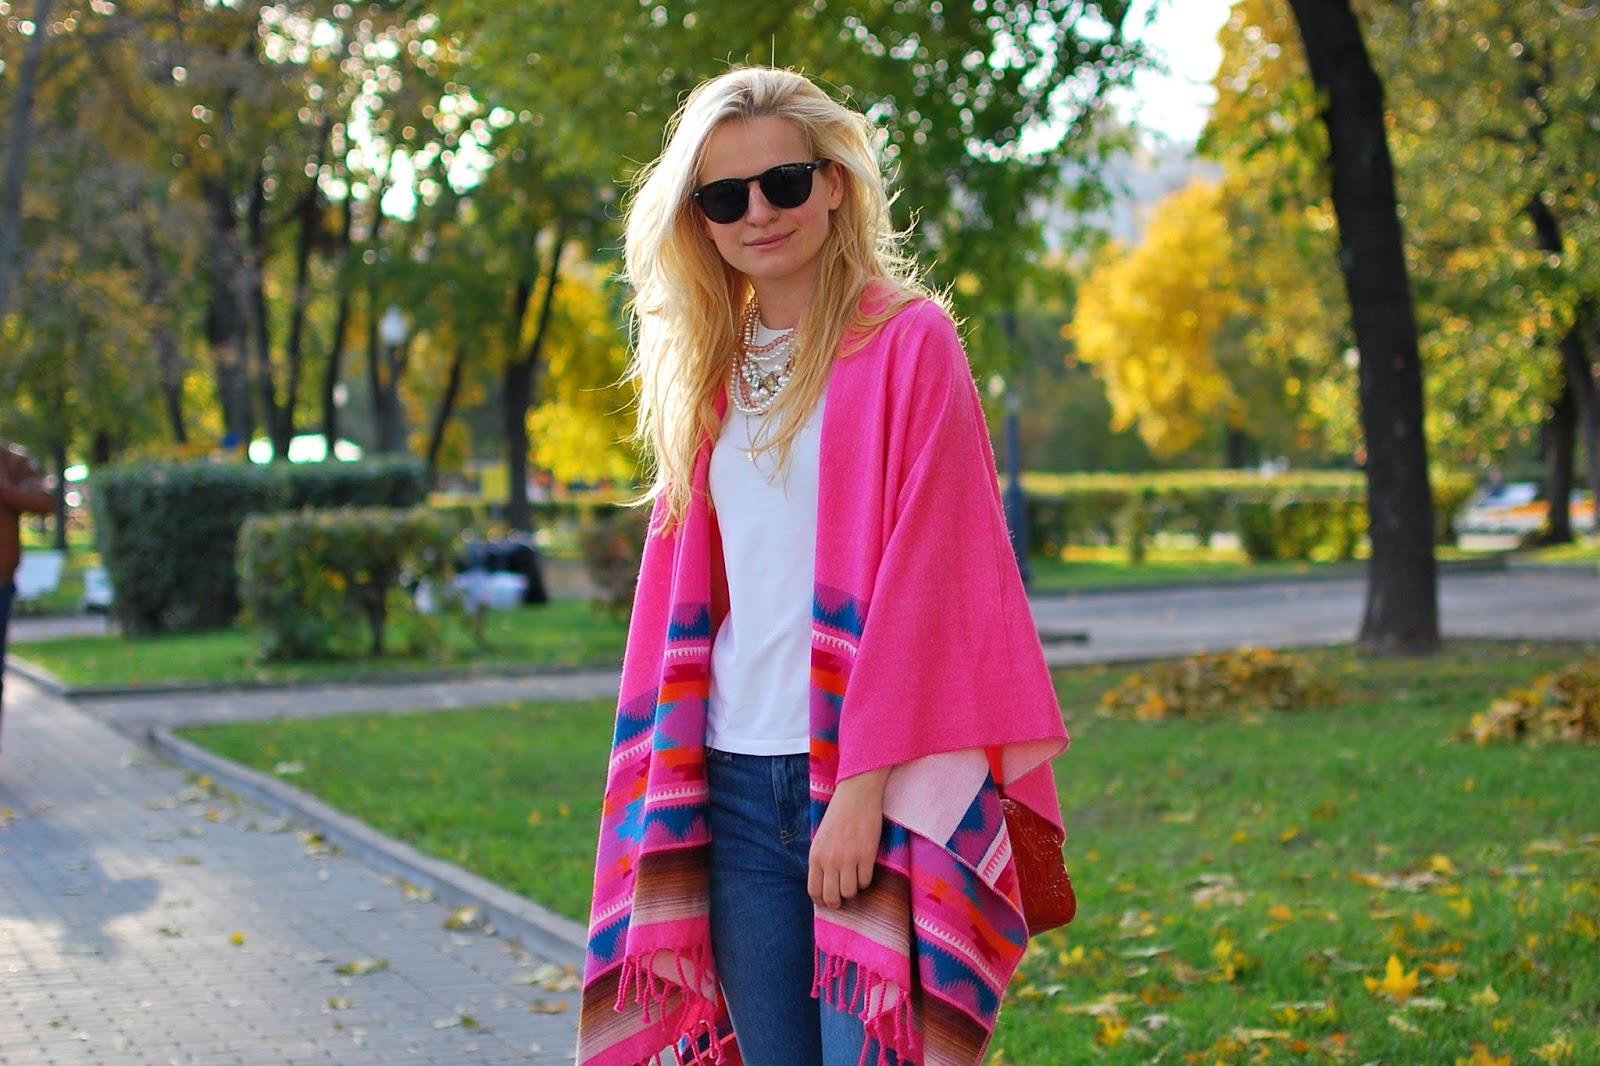 street style, fashion outfit autumn, осенние луки 2016